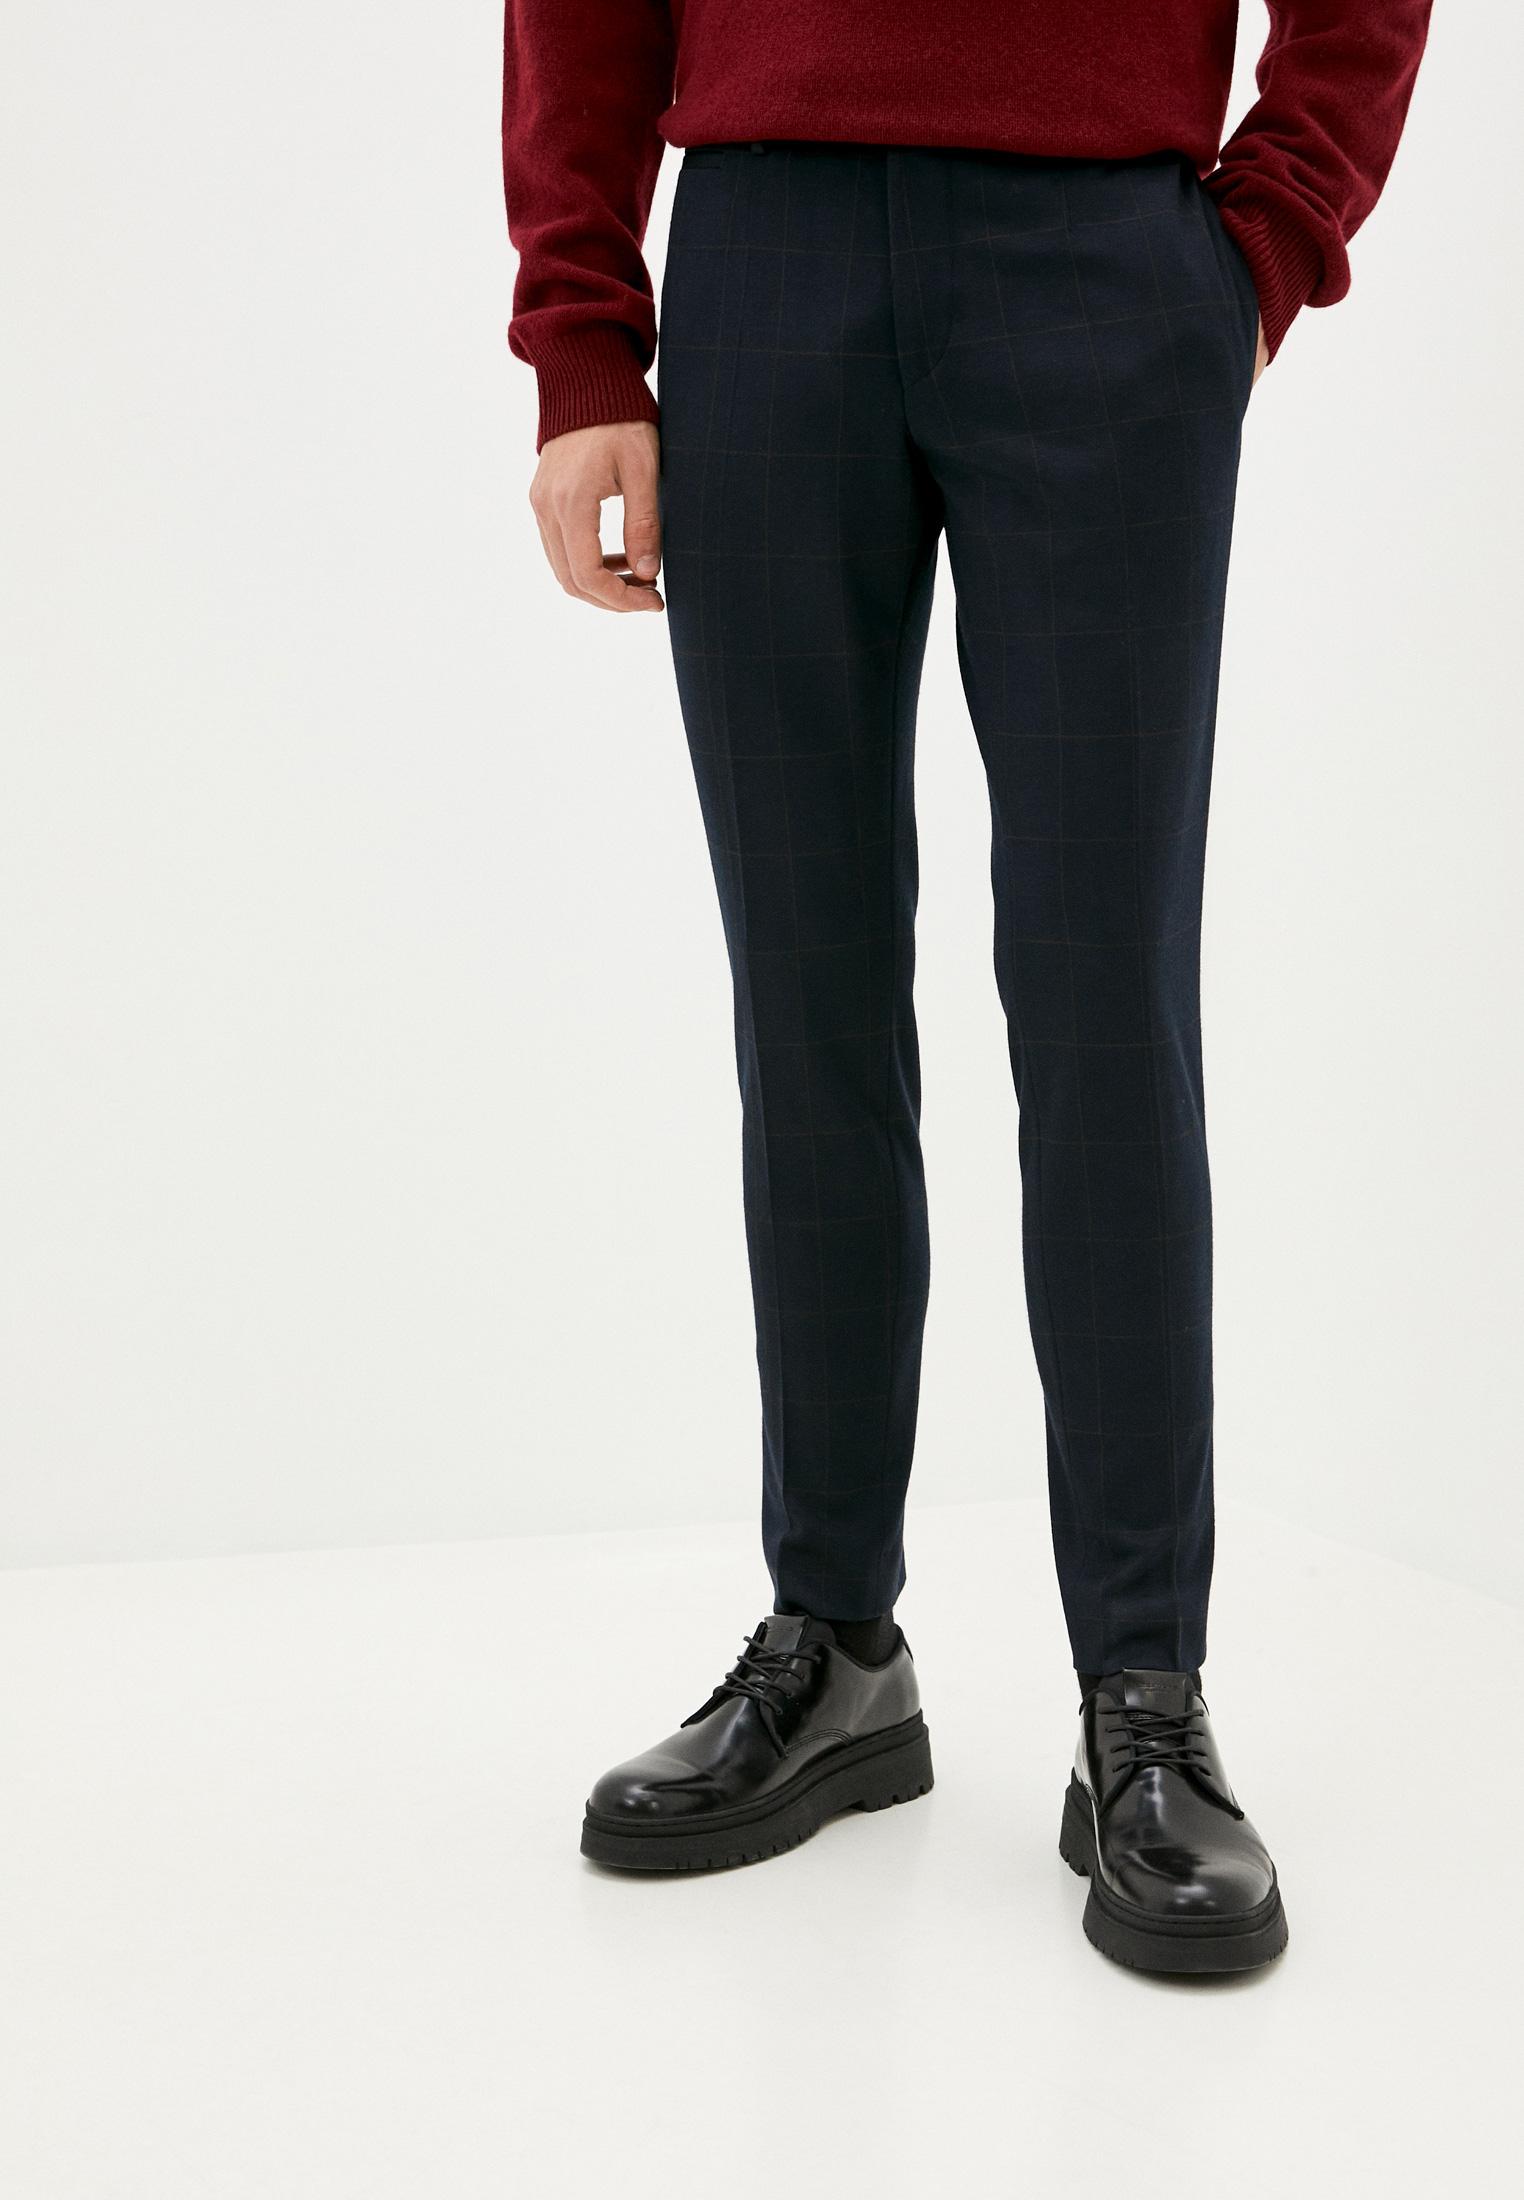 брюки мужские 2021 на свадьбу